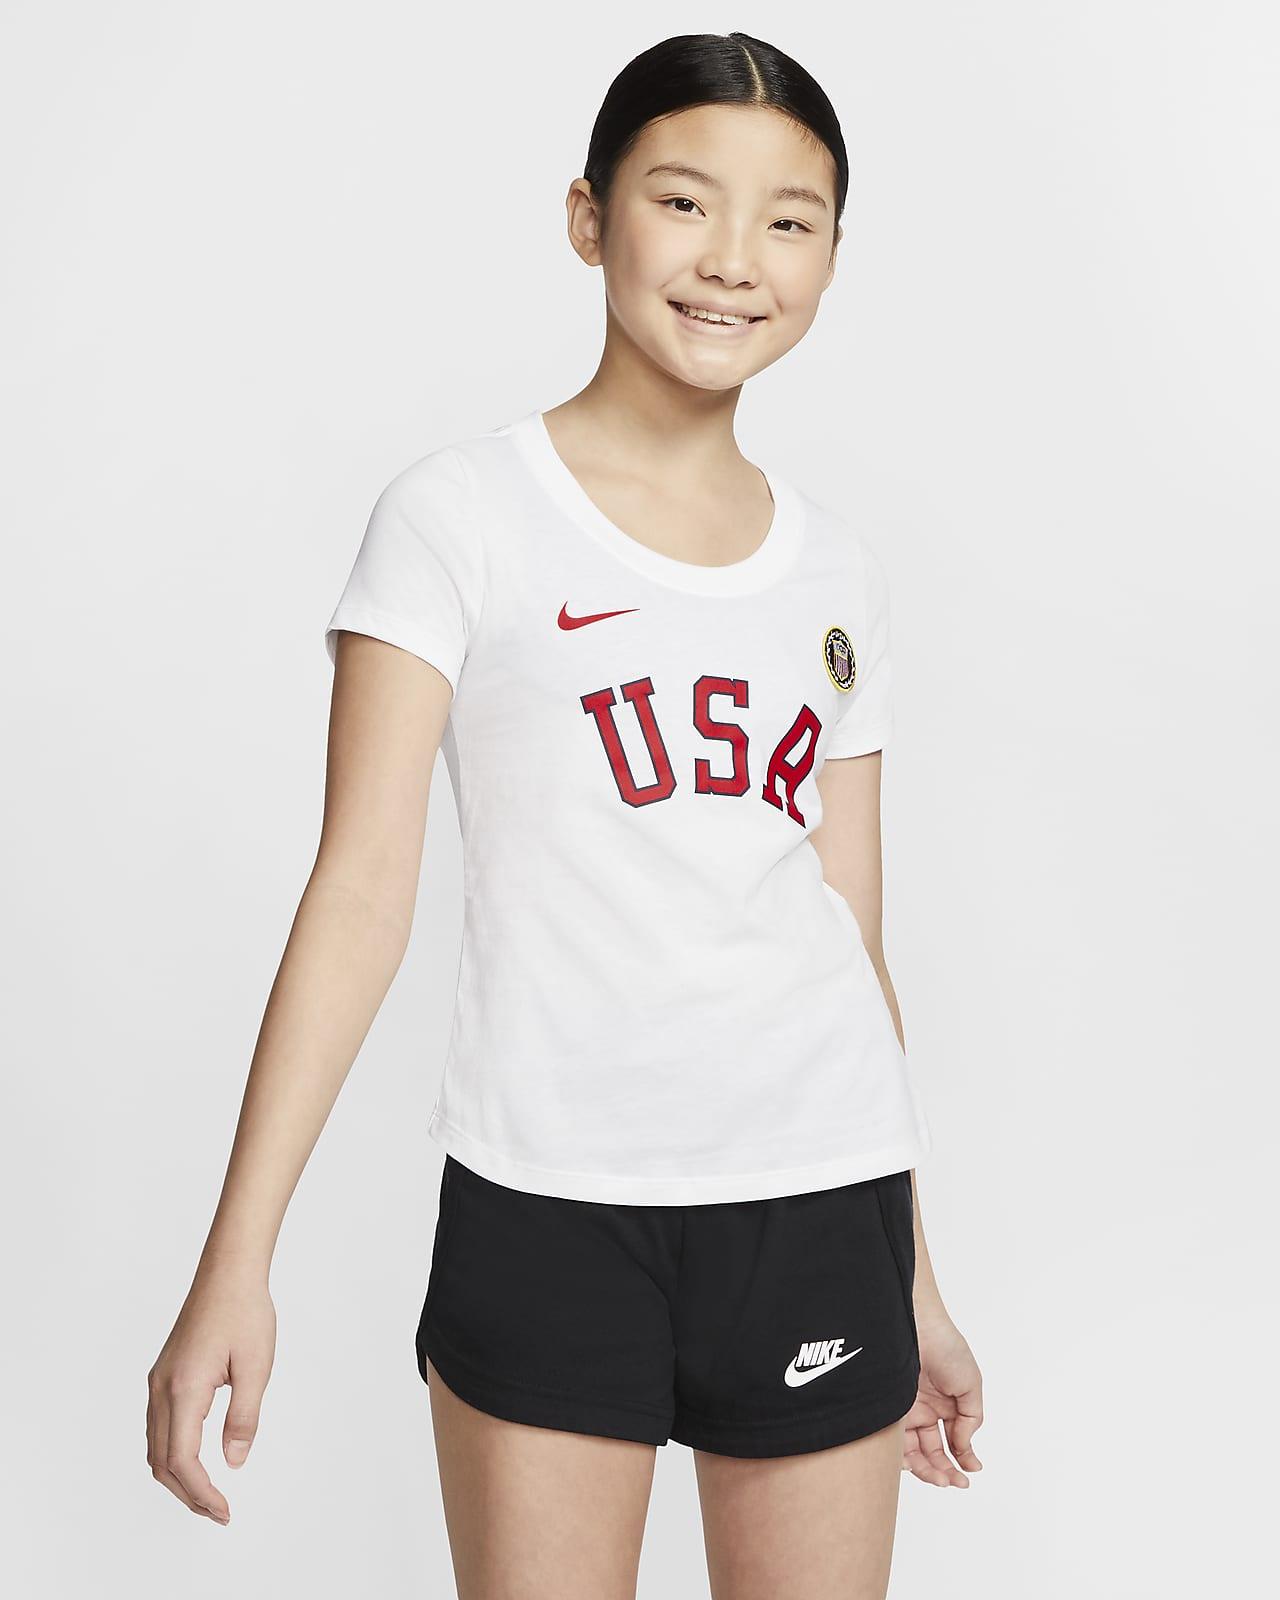 Nike Sportswear Team USA Big Kids' (Girls') T-Shirt